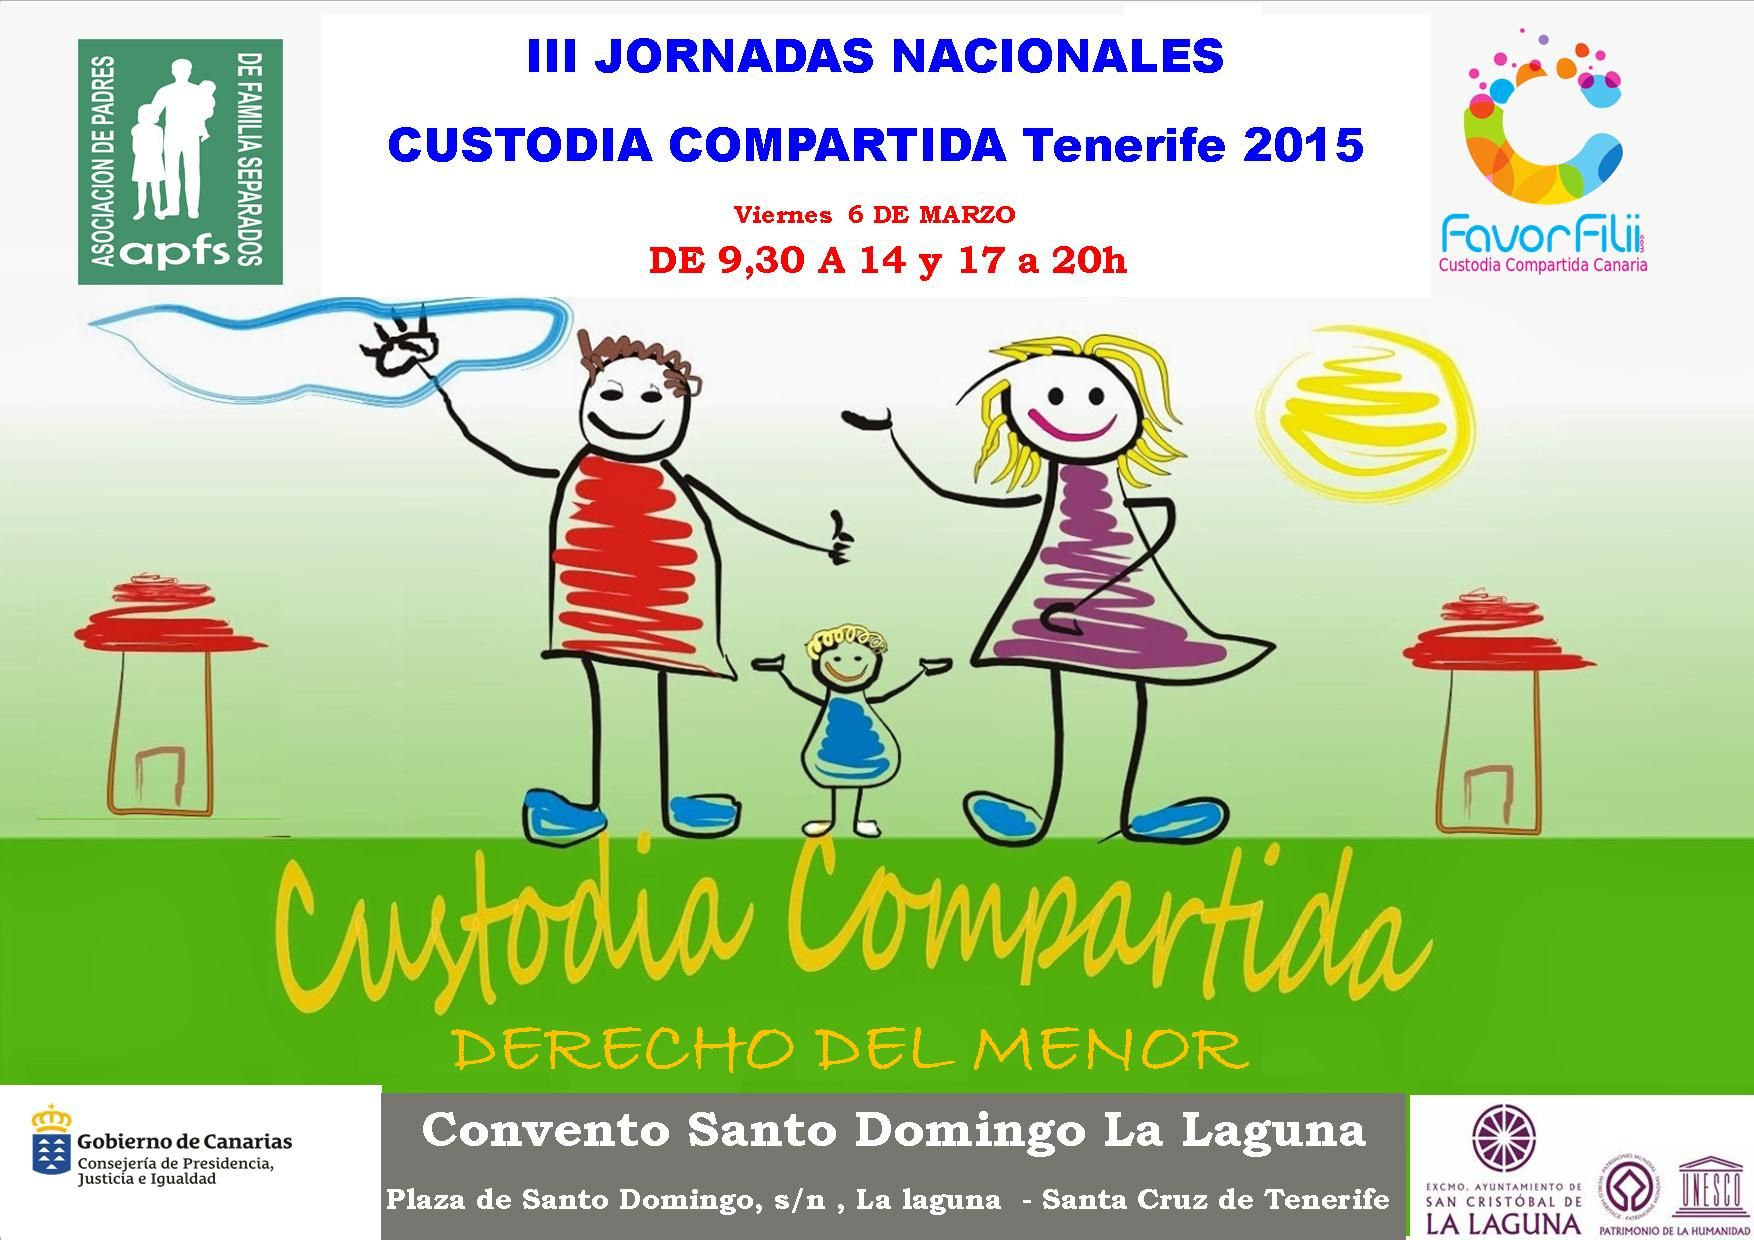 III JORNADAS CUSTODIA COMPARTIDA